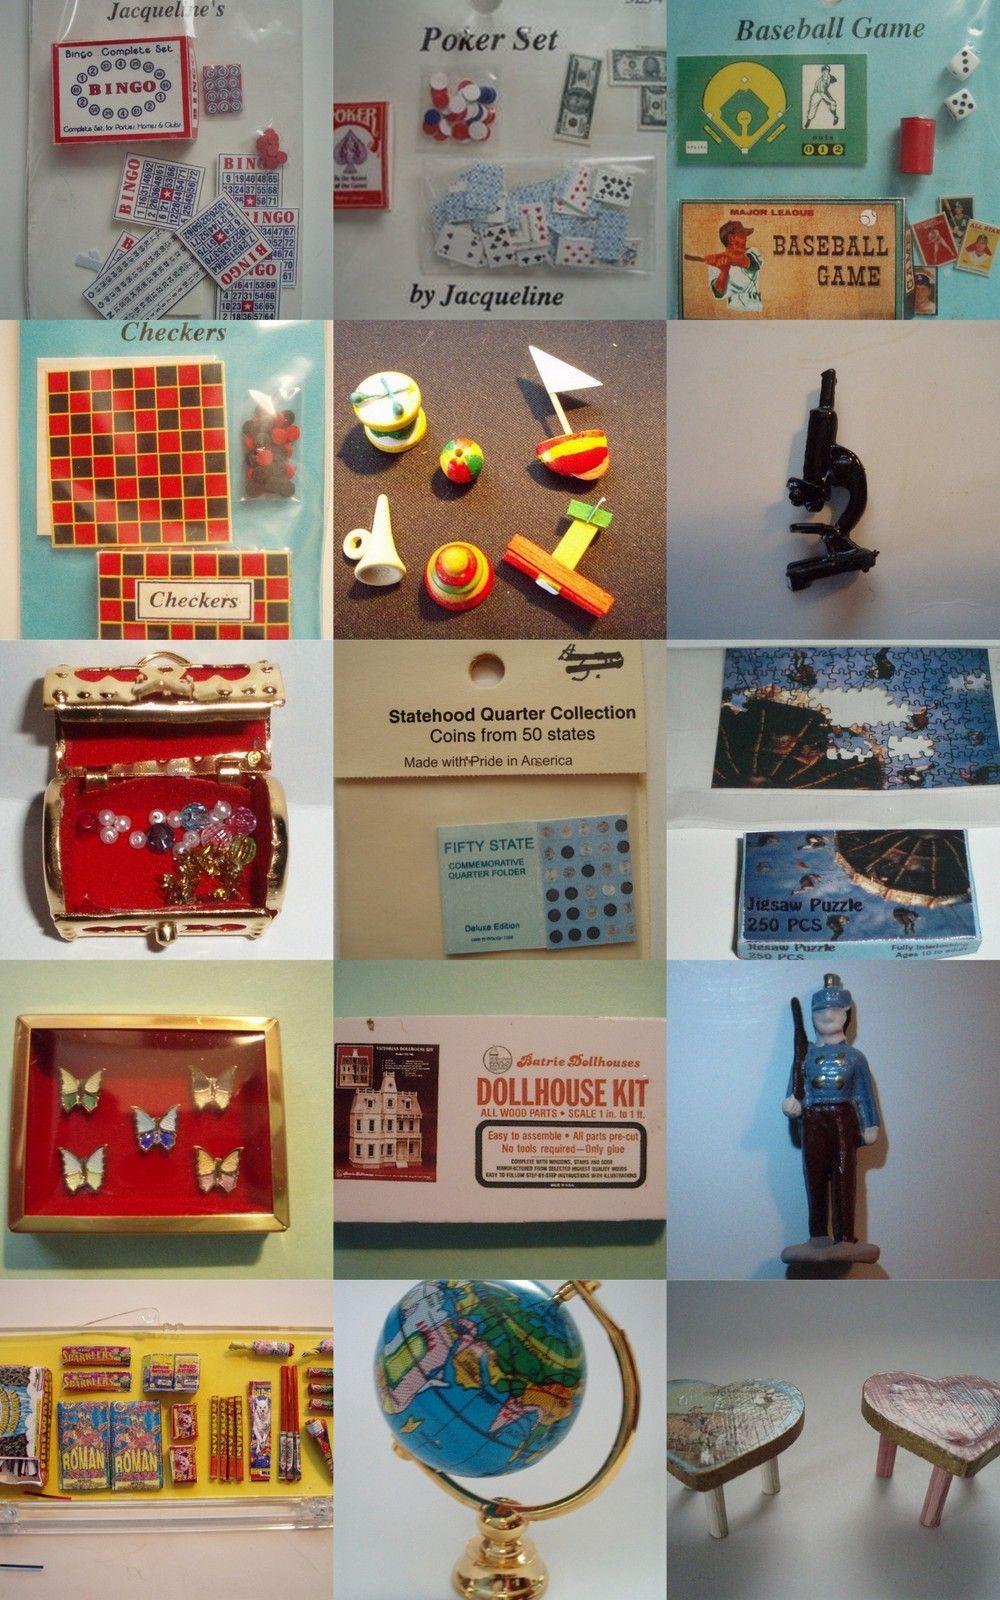 Dollhouse Games & Toys